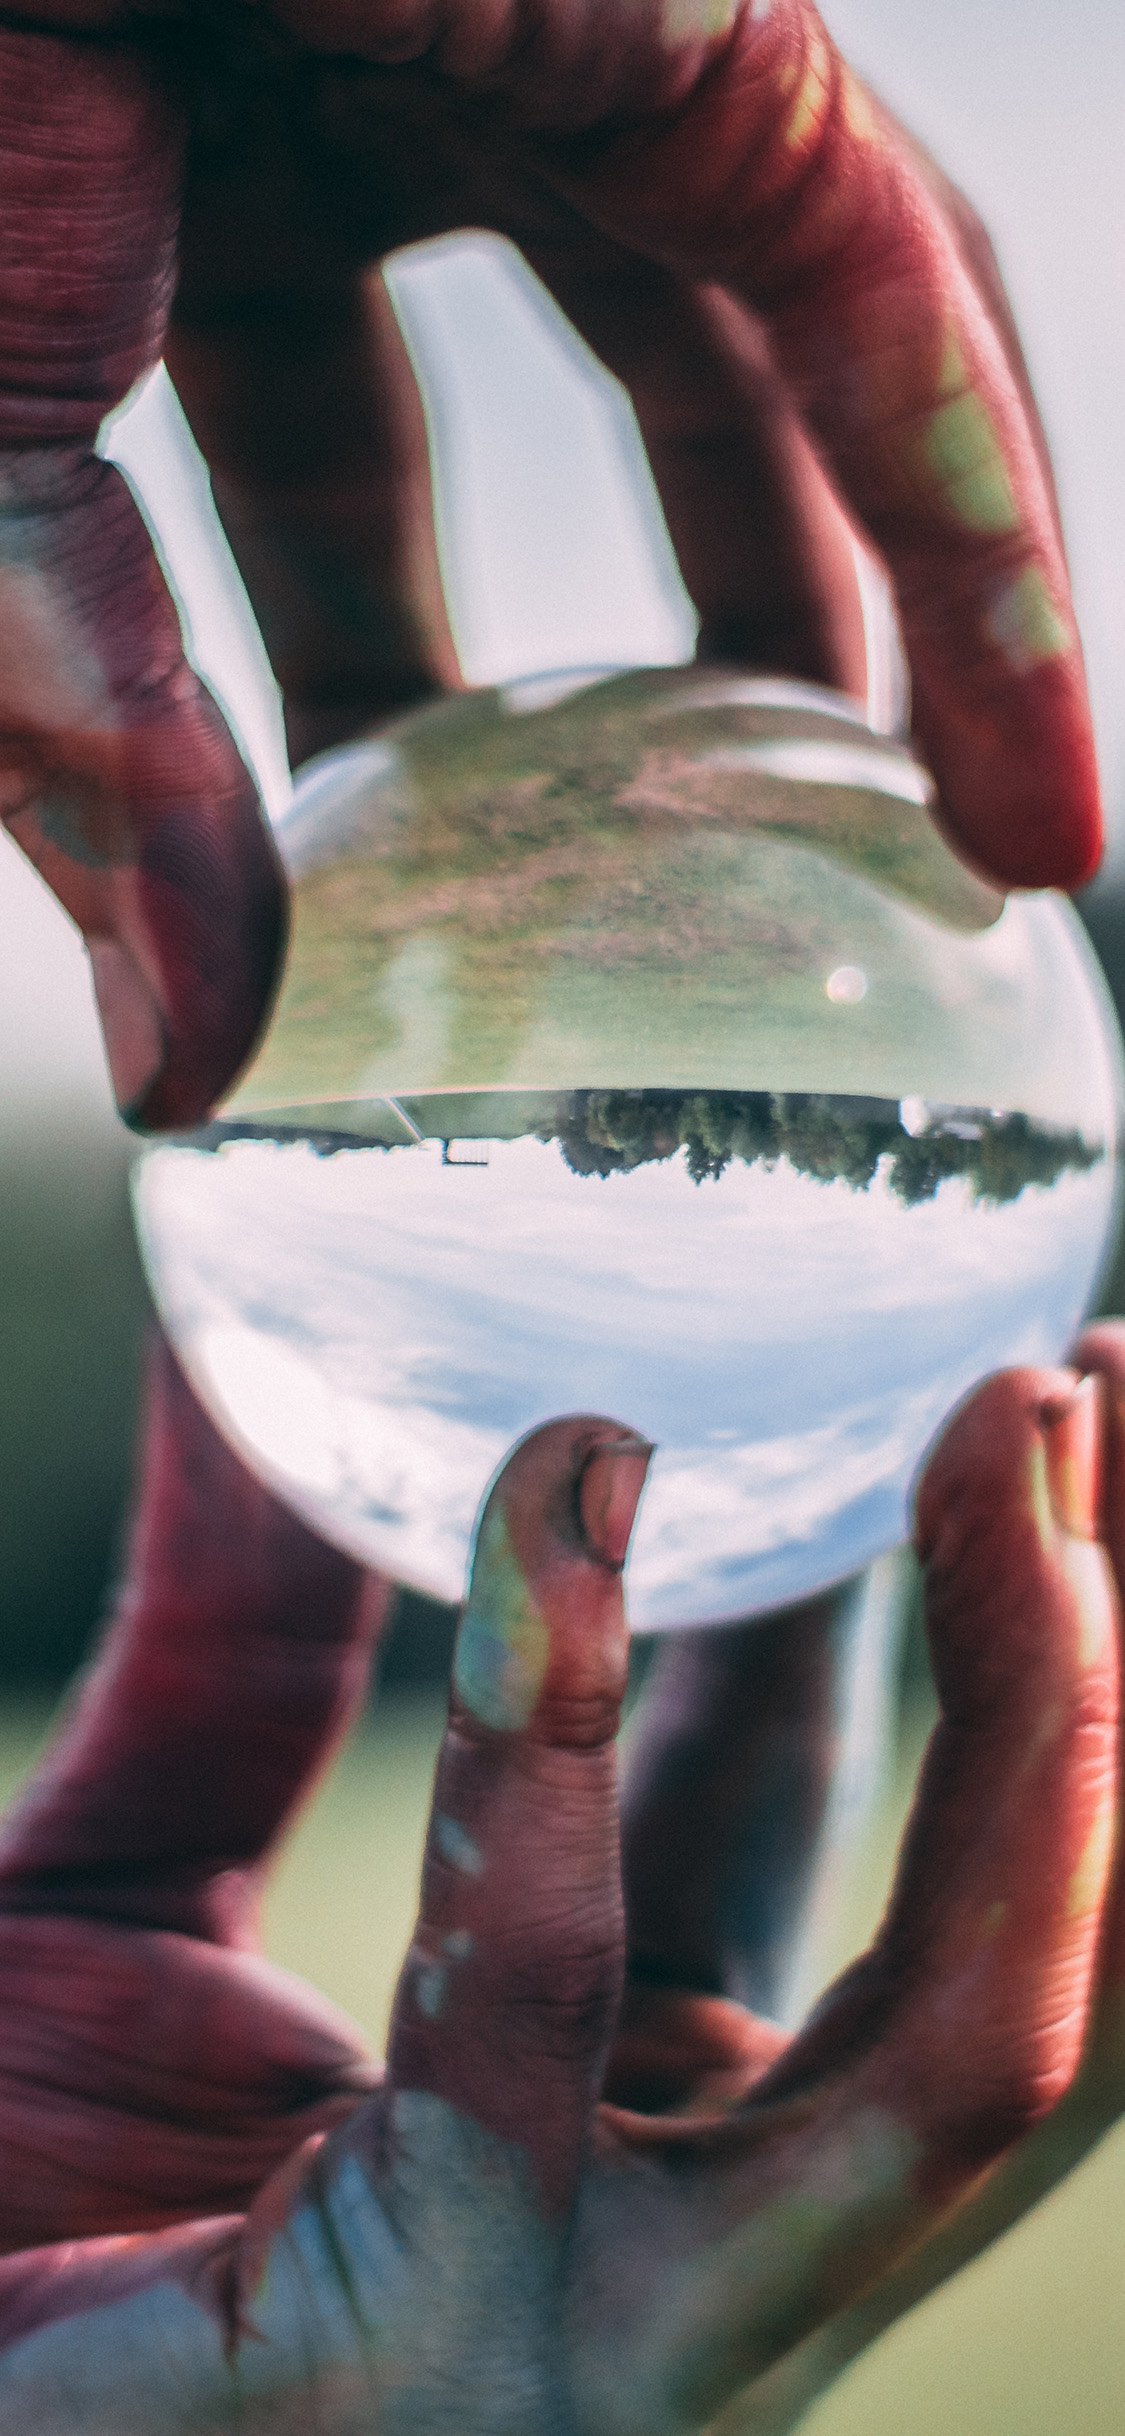 iPhonexpapers.com-Apple-iPhone-wallpaper-bh71-glass-glove-hand-art